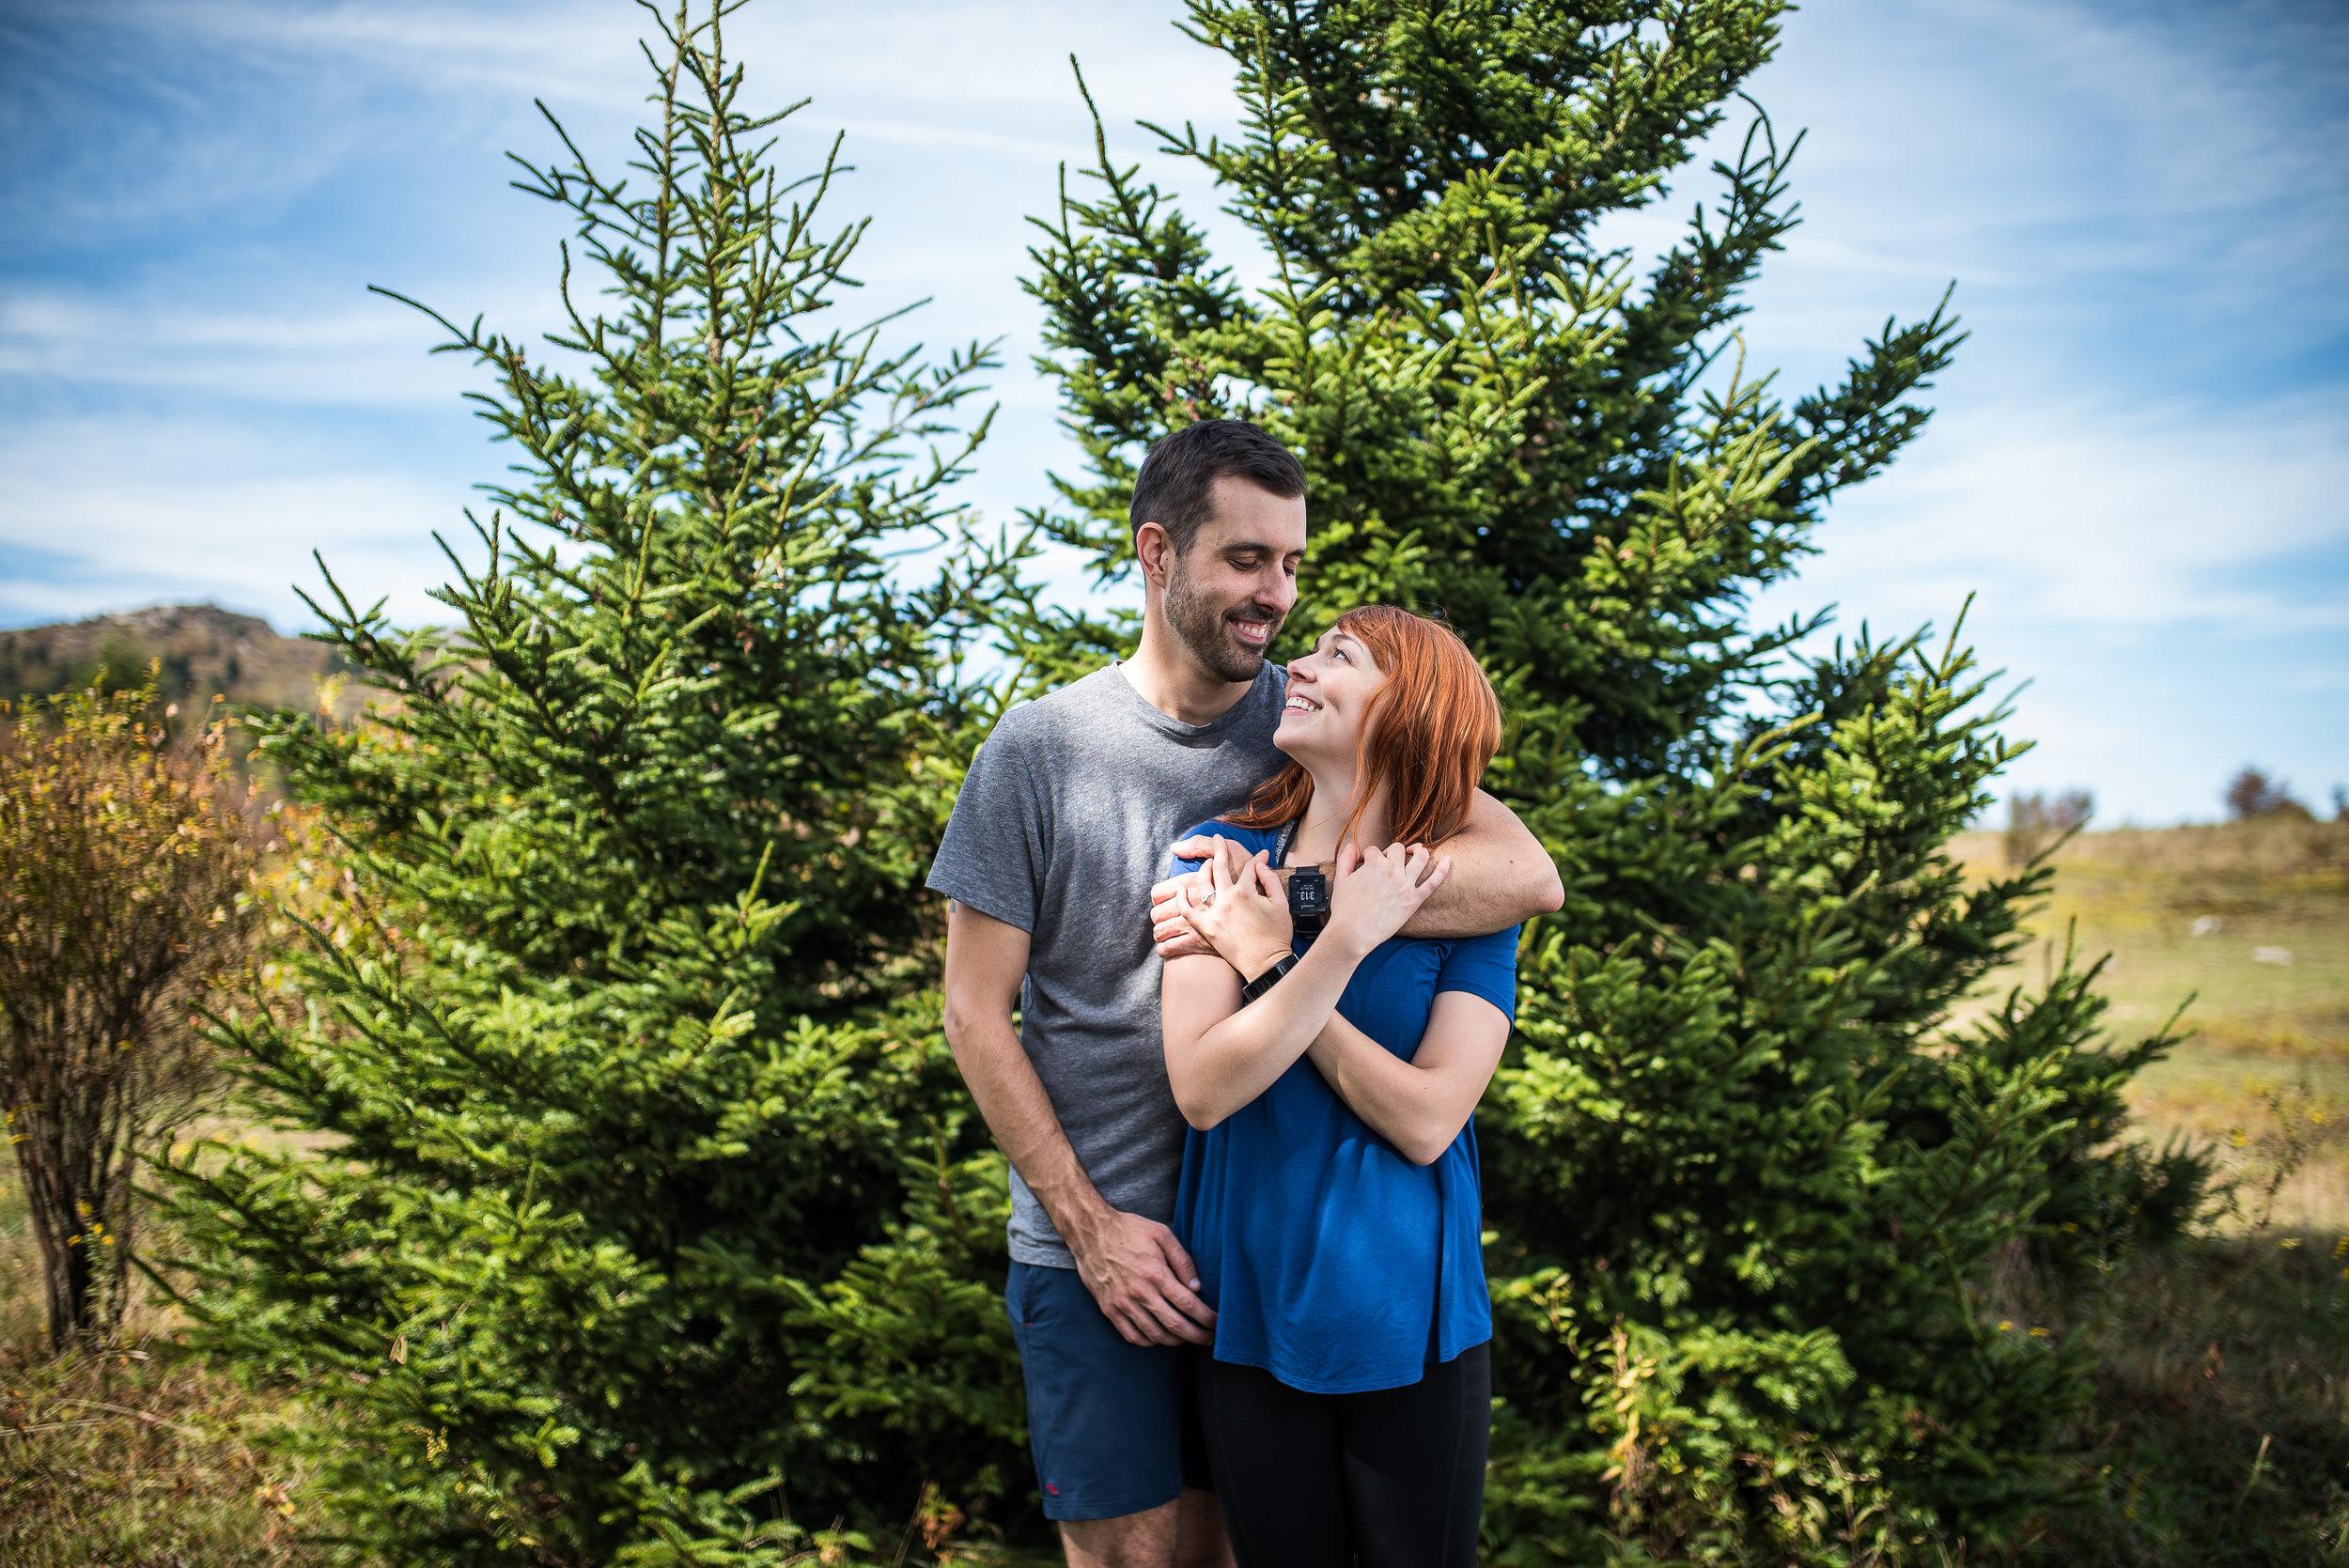 Grayson Highlands Engagement - North Carolina Wedding Photographer - Destination Wedding Photographer